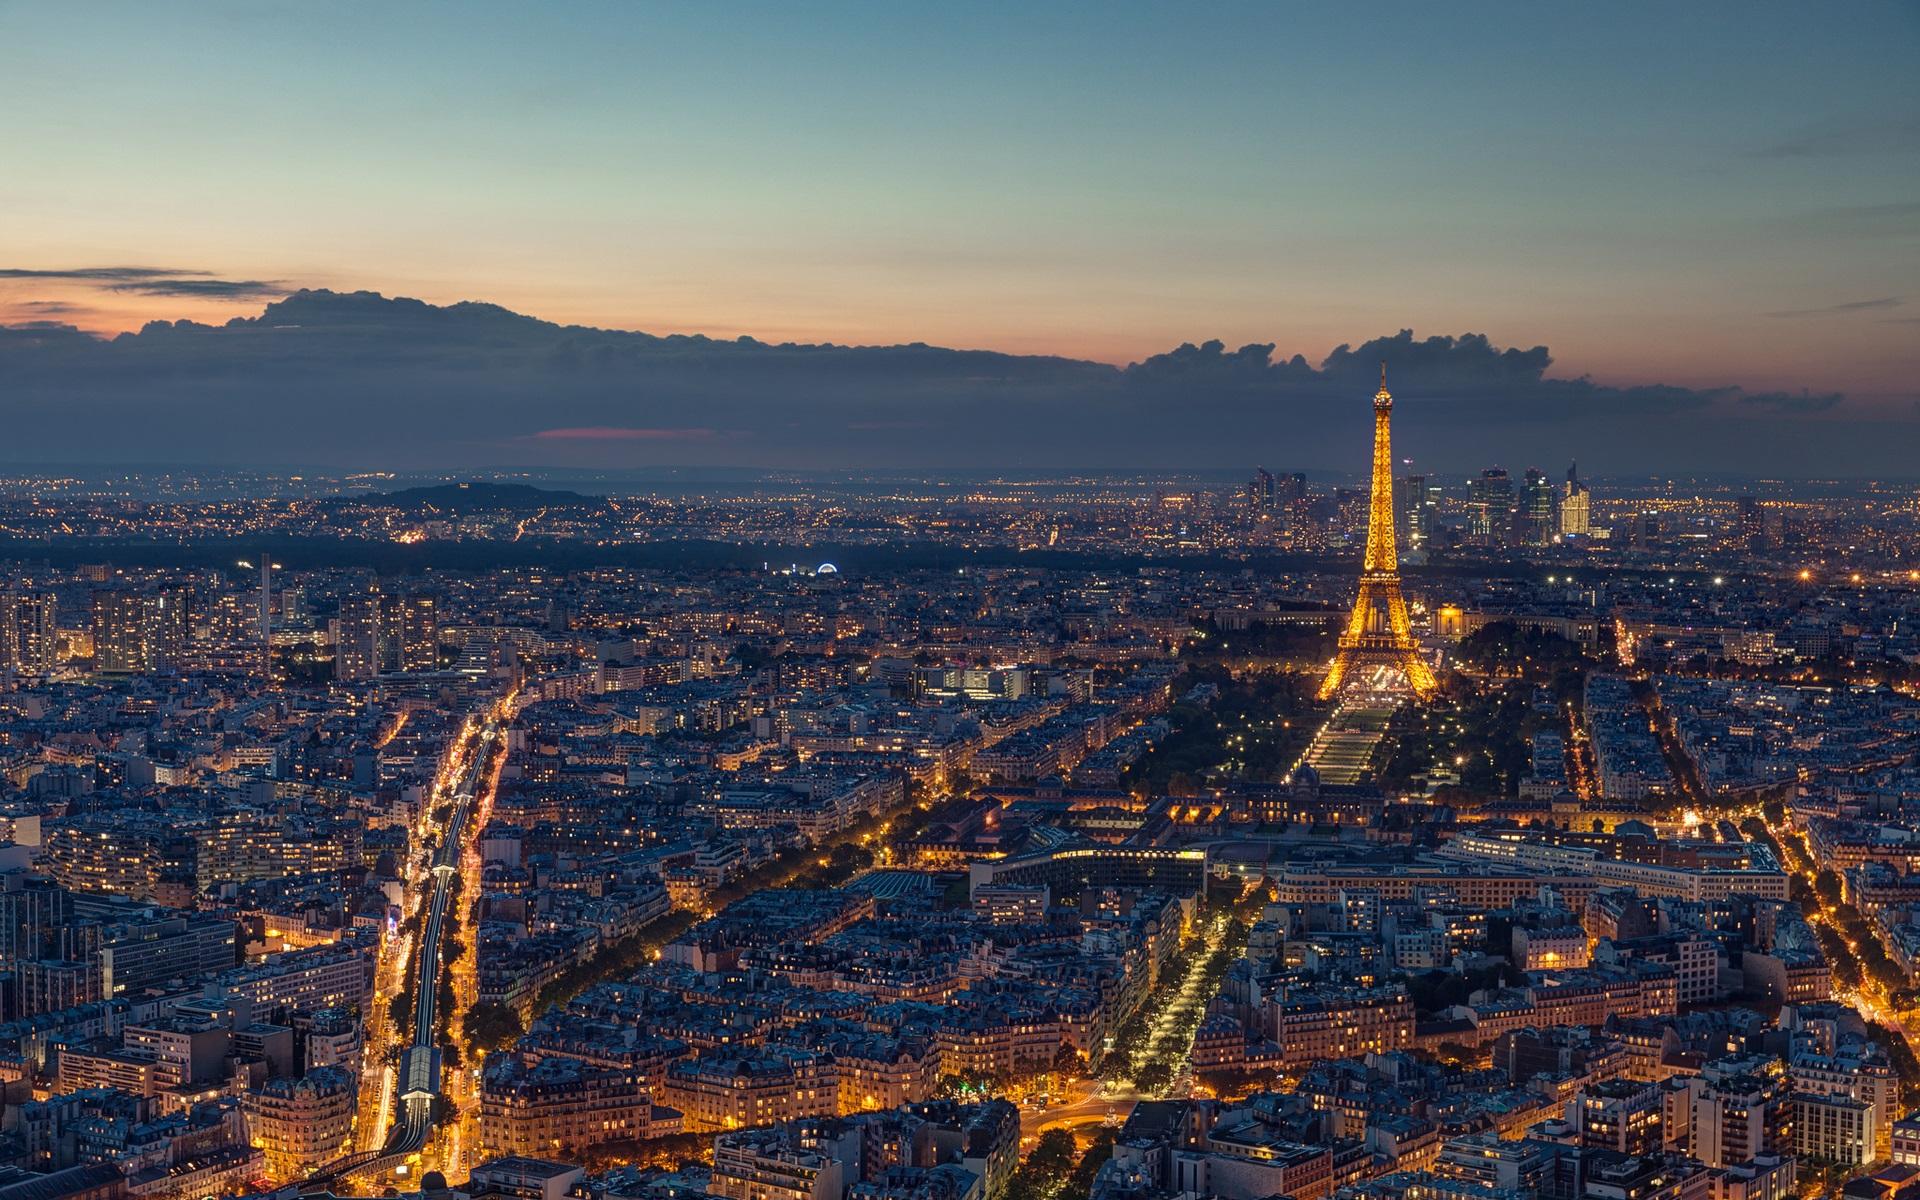 Обои Эйфелева башня, Облака, вид, лодки, красиво. Города foto 8